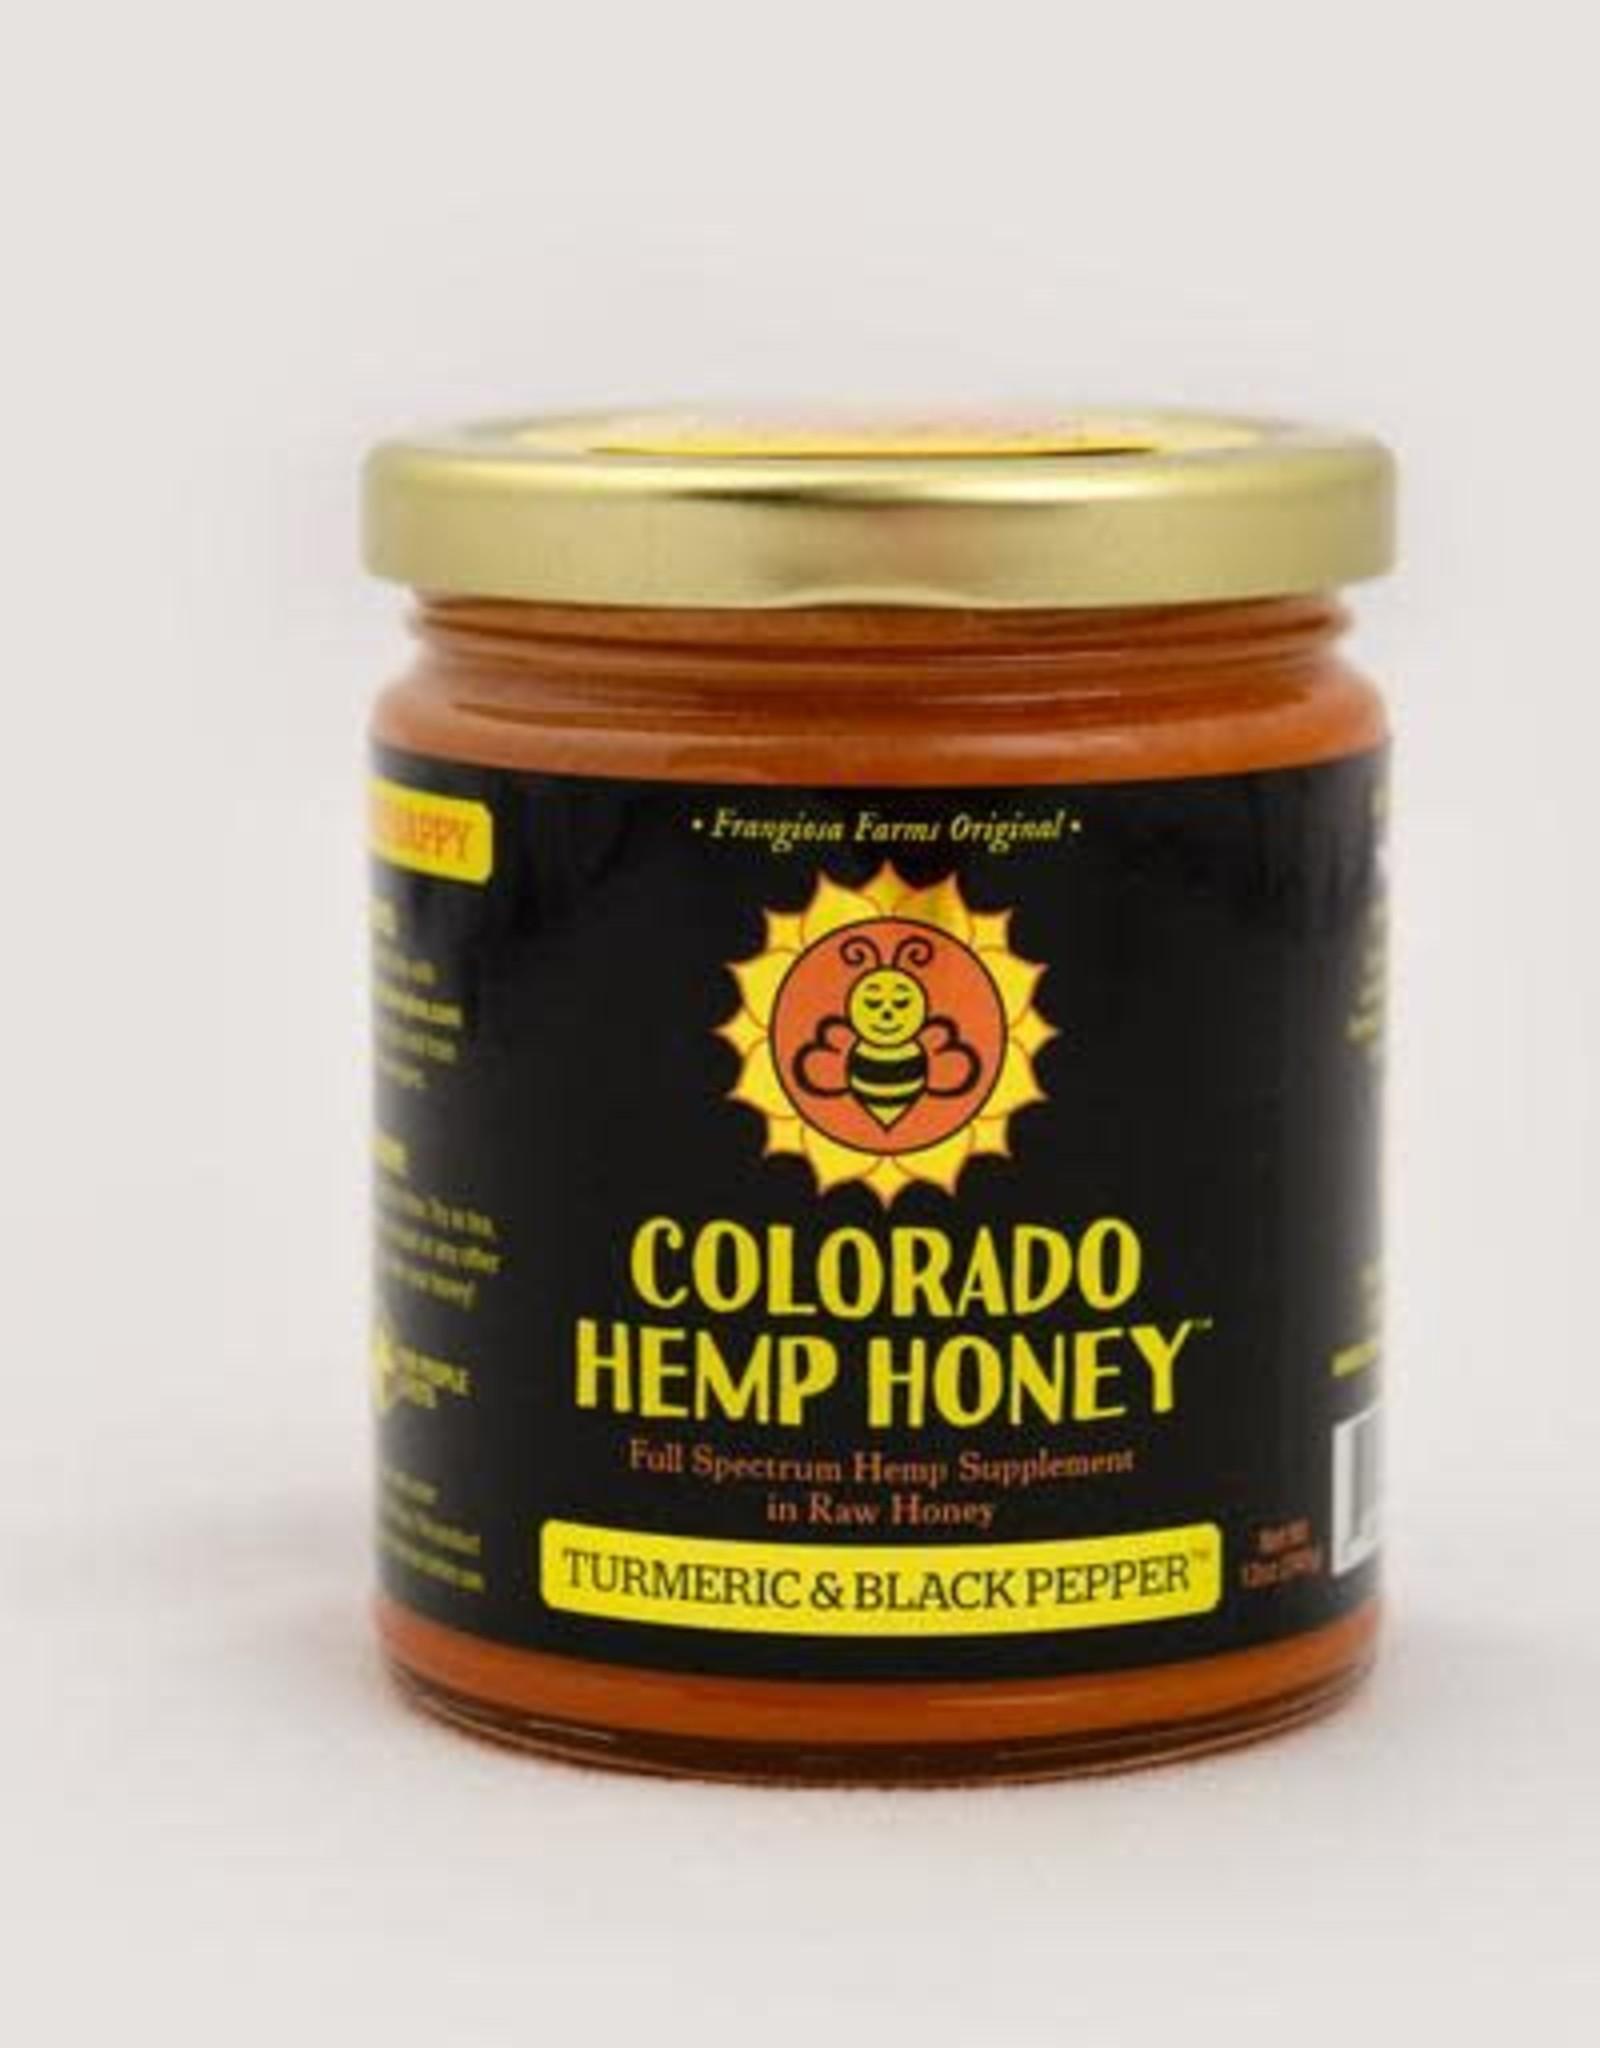 Colorado Hemp Honey Colorado Hemp Honey Turmeric & Black Pepper 6oz Jar